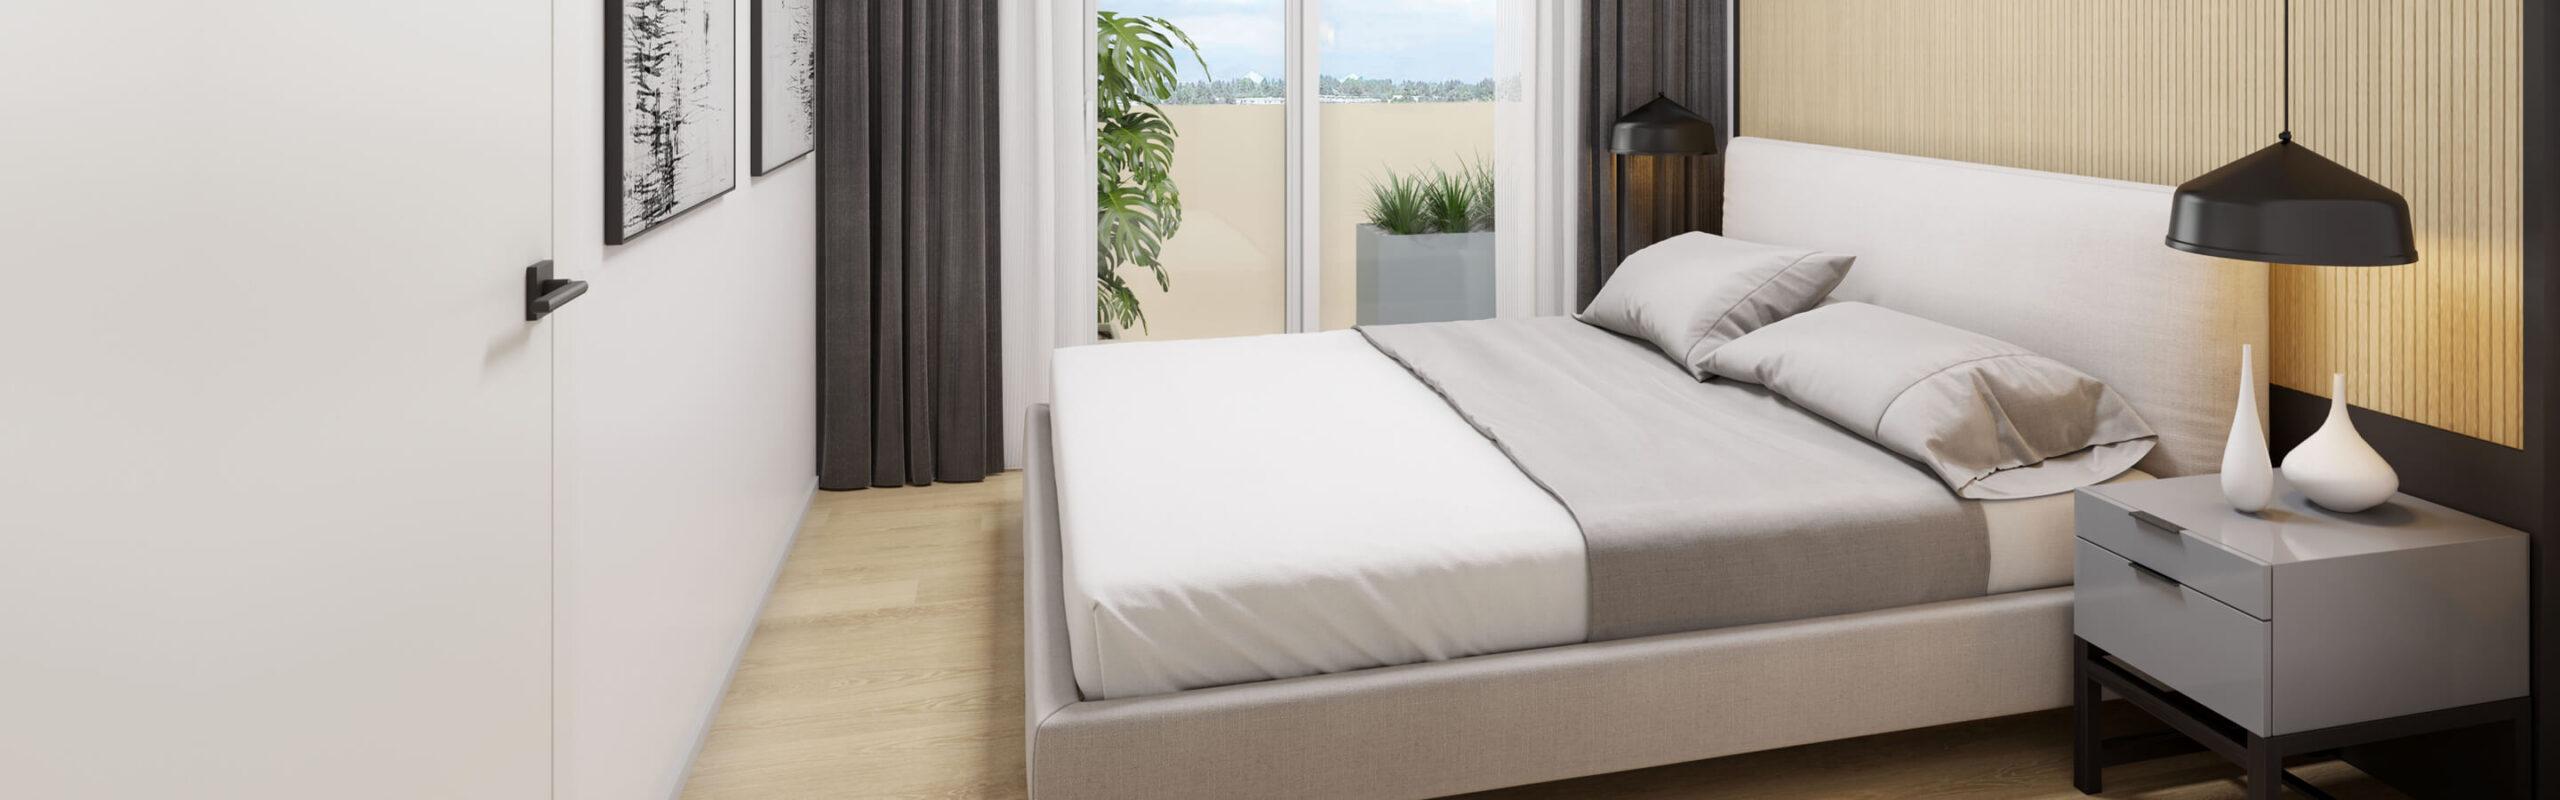 parallax-bedroom